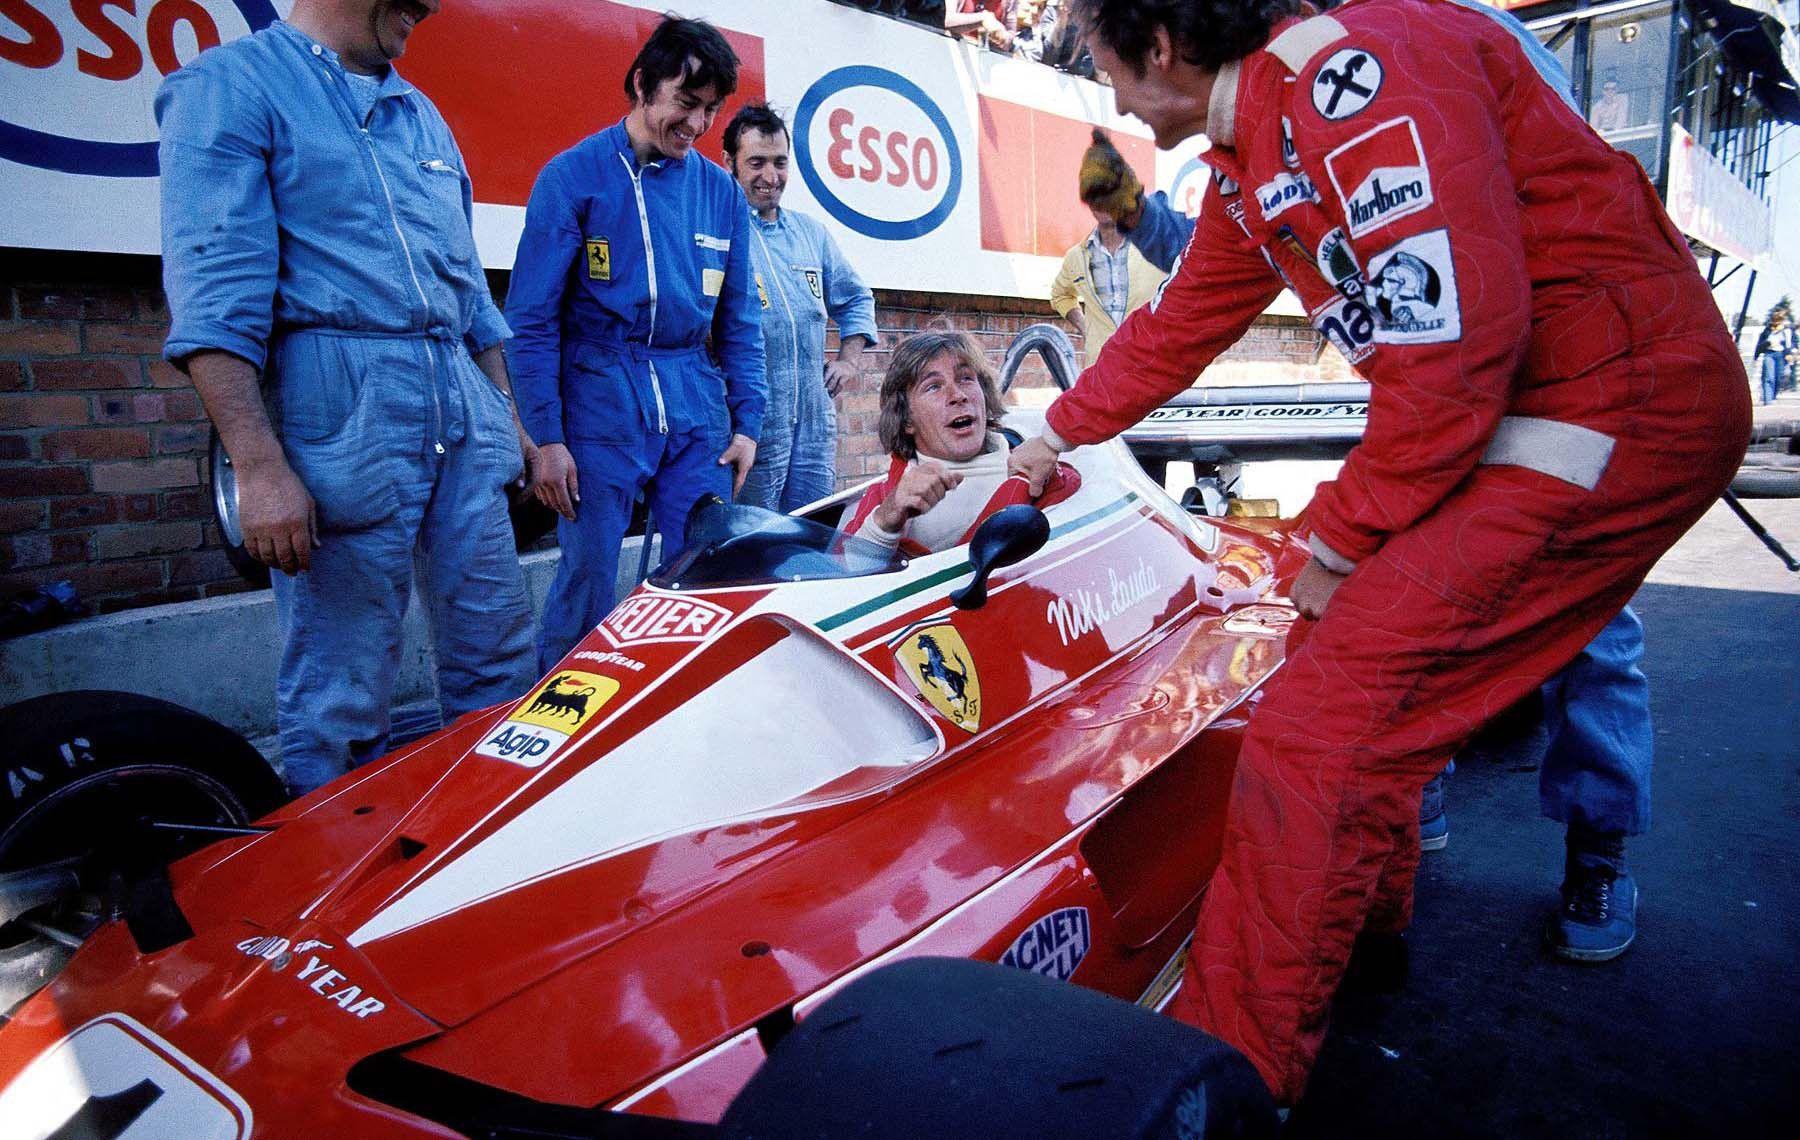 James Hunt in Niki Lauda's Ferrari 312T2, 1976 Monaco GP (self-repost with higher resolution and better colors) [1800x1140] - Imgur